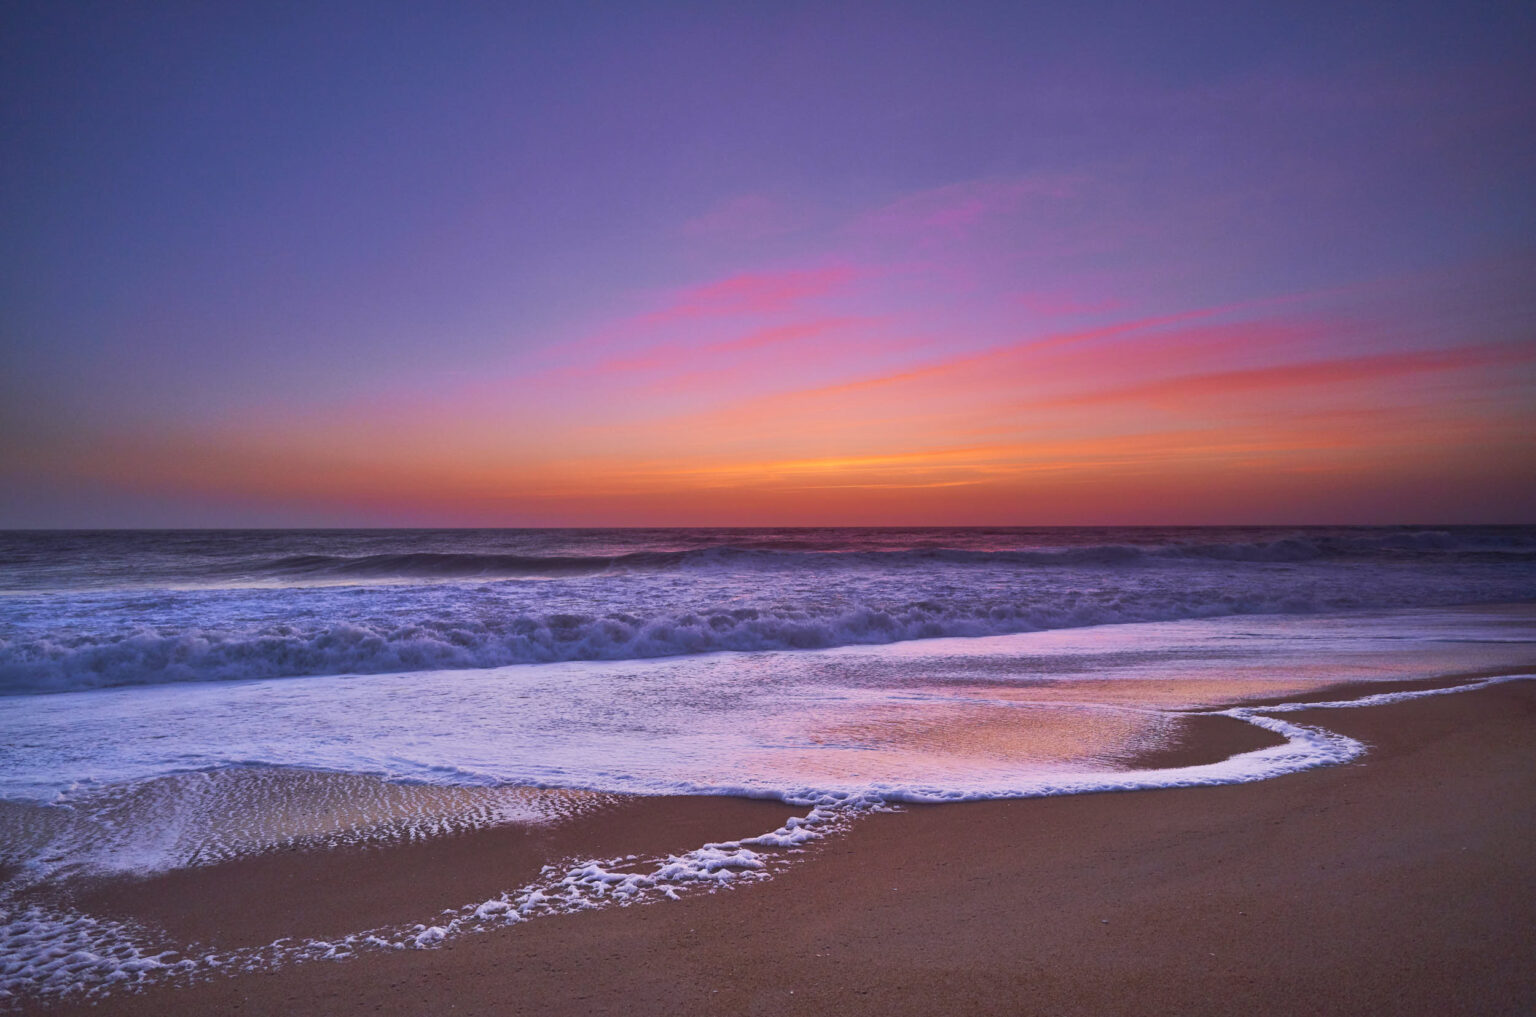 After sunset at Nazare Beach